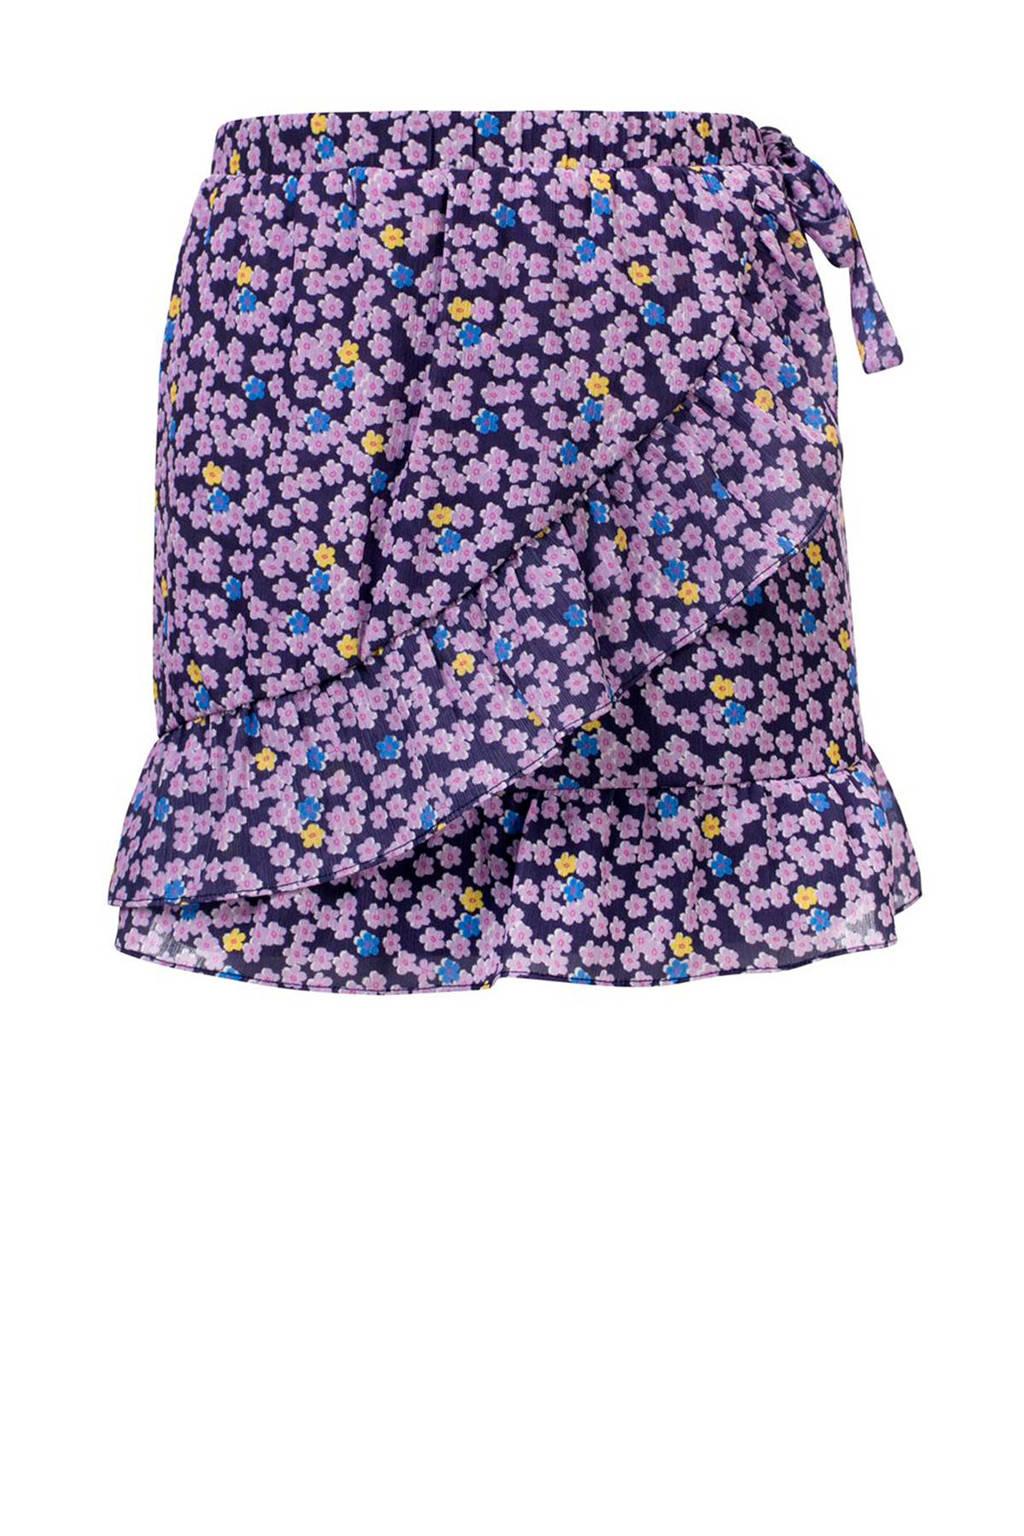 LOOXS gebloemde rok lila/blauw, Lila/blauw